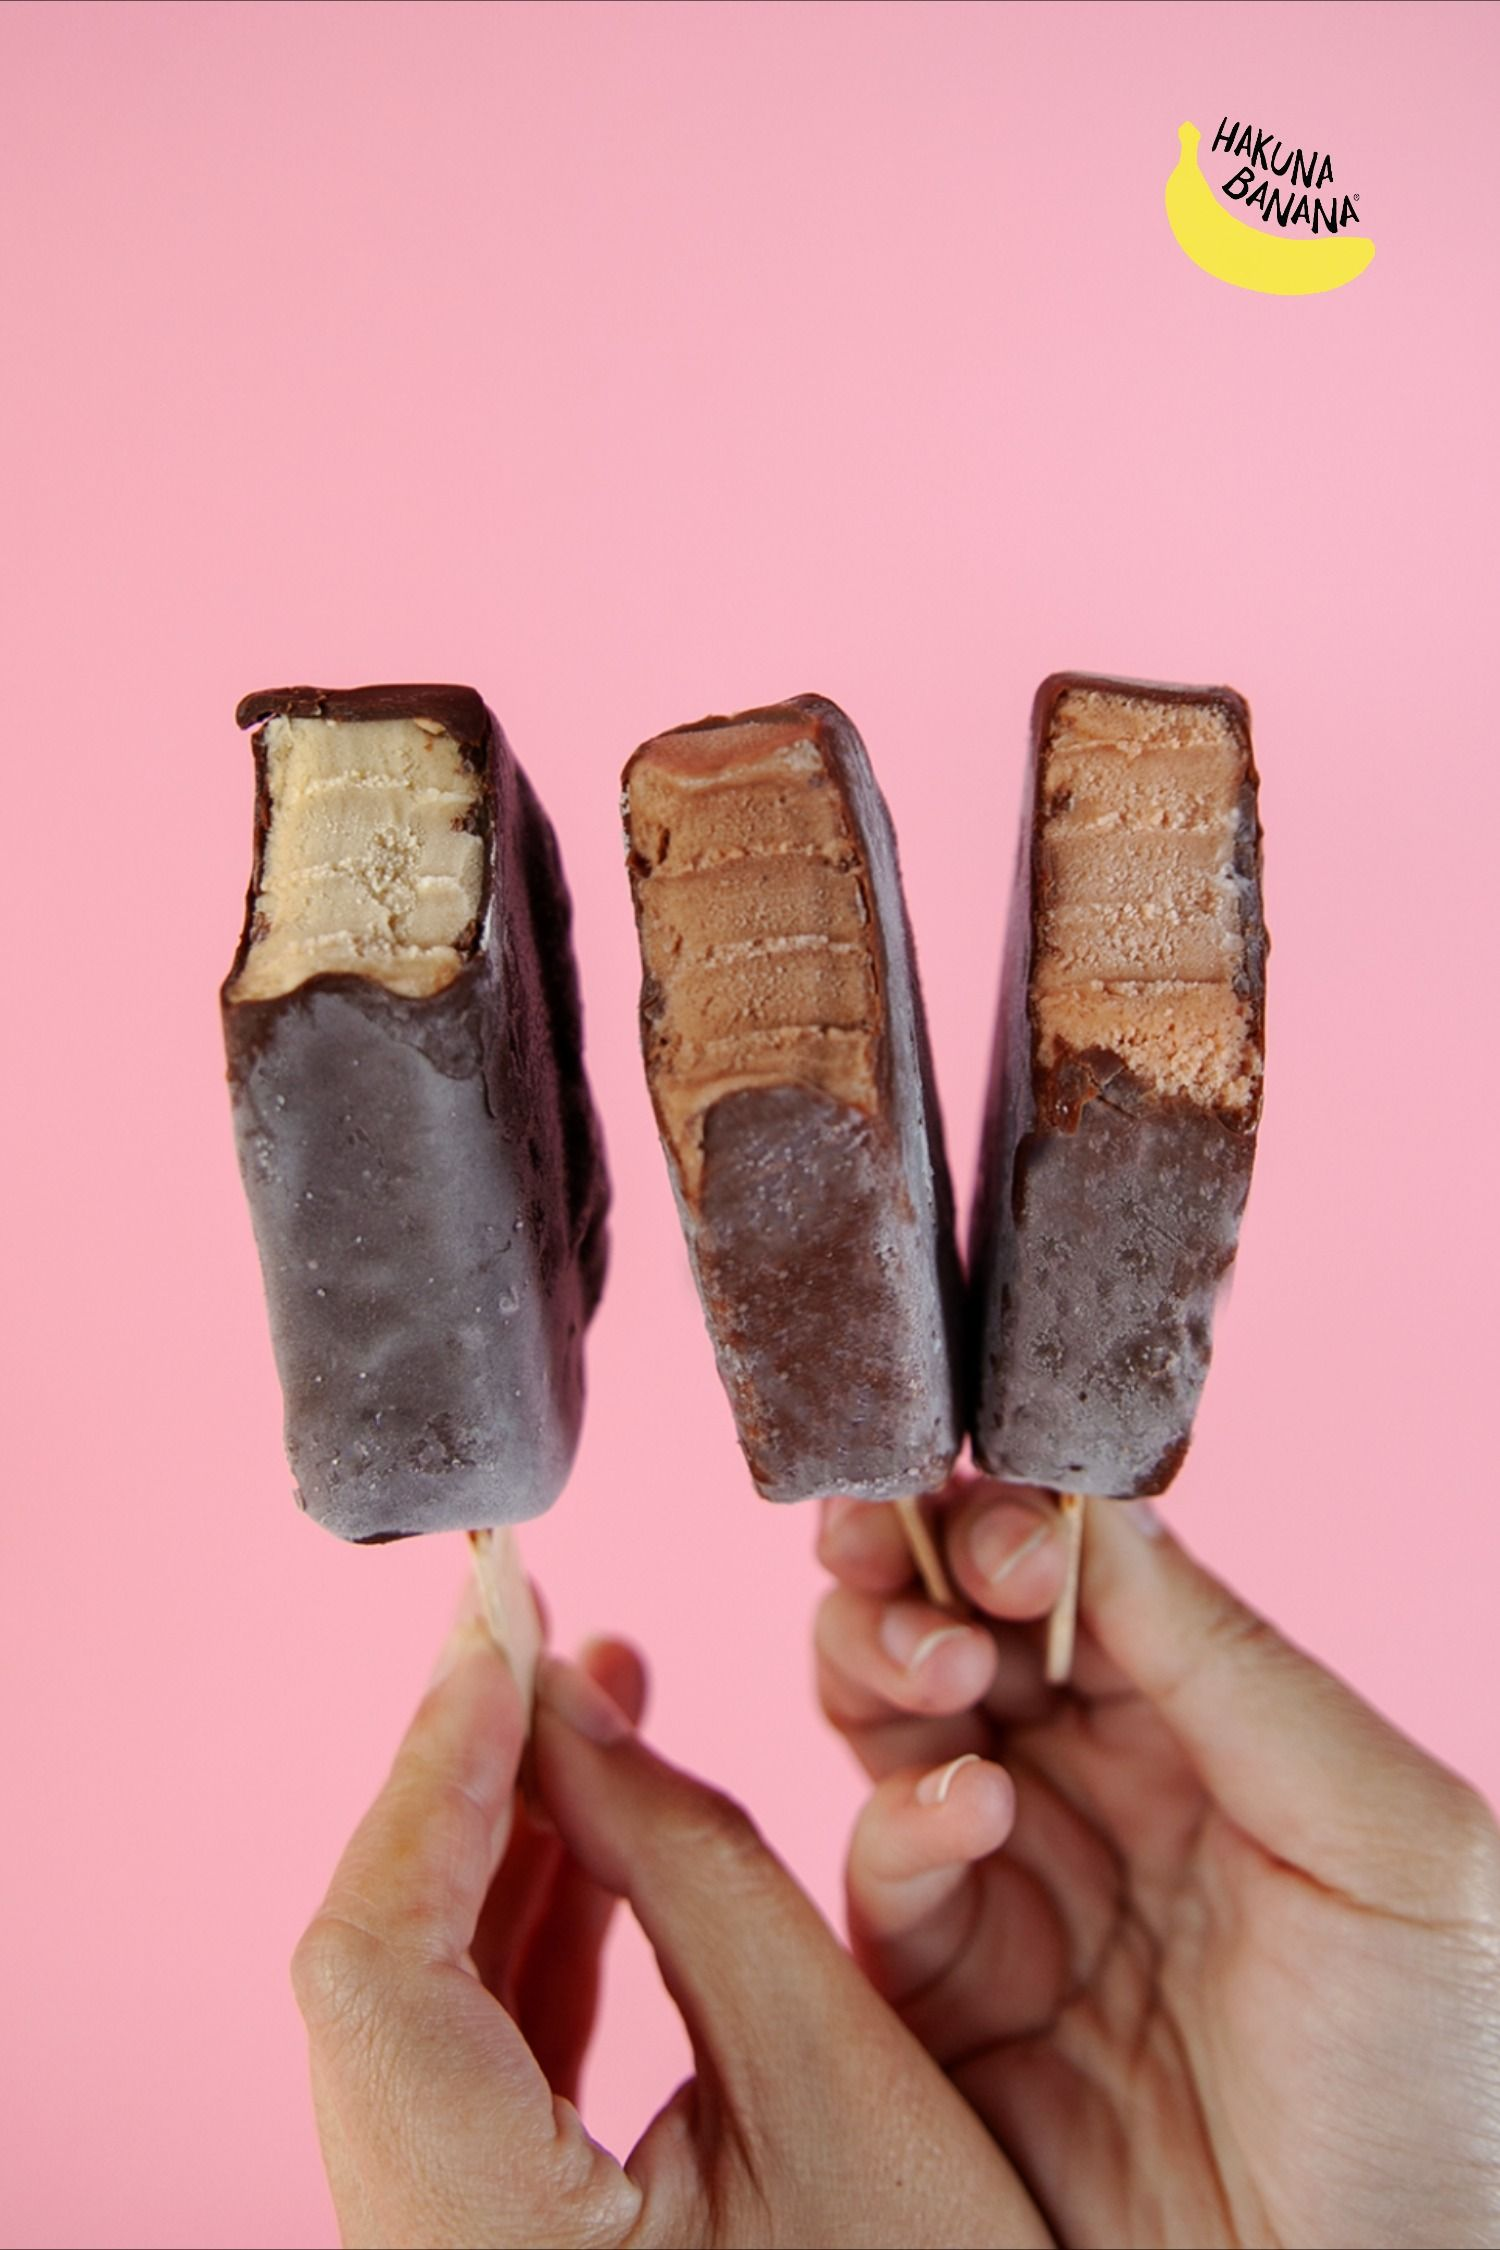 Refined SugarFree in 2020 Refined sugar free, Chocolate